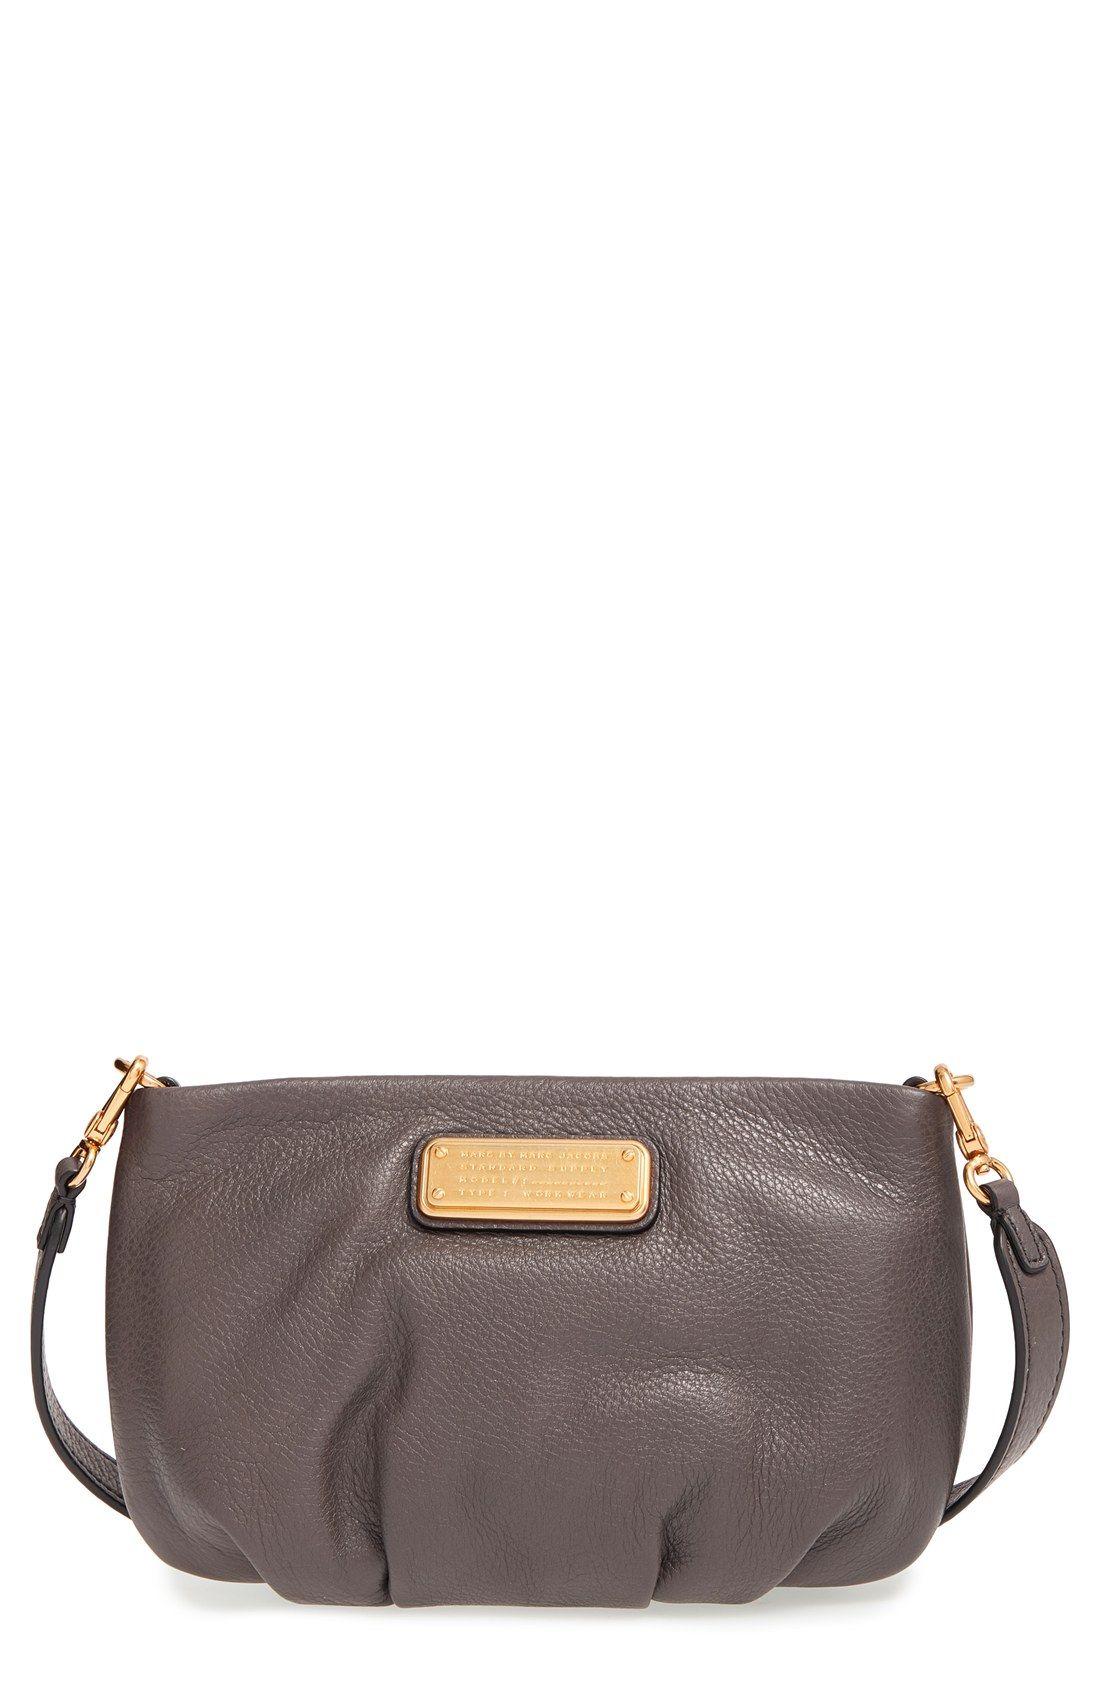 15941da3f4fb MARC BY MARC JACOBS  New Q - Percy  Leather Crossbody Bag